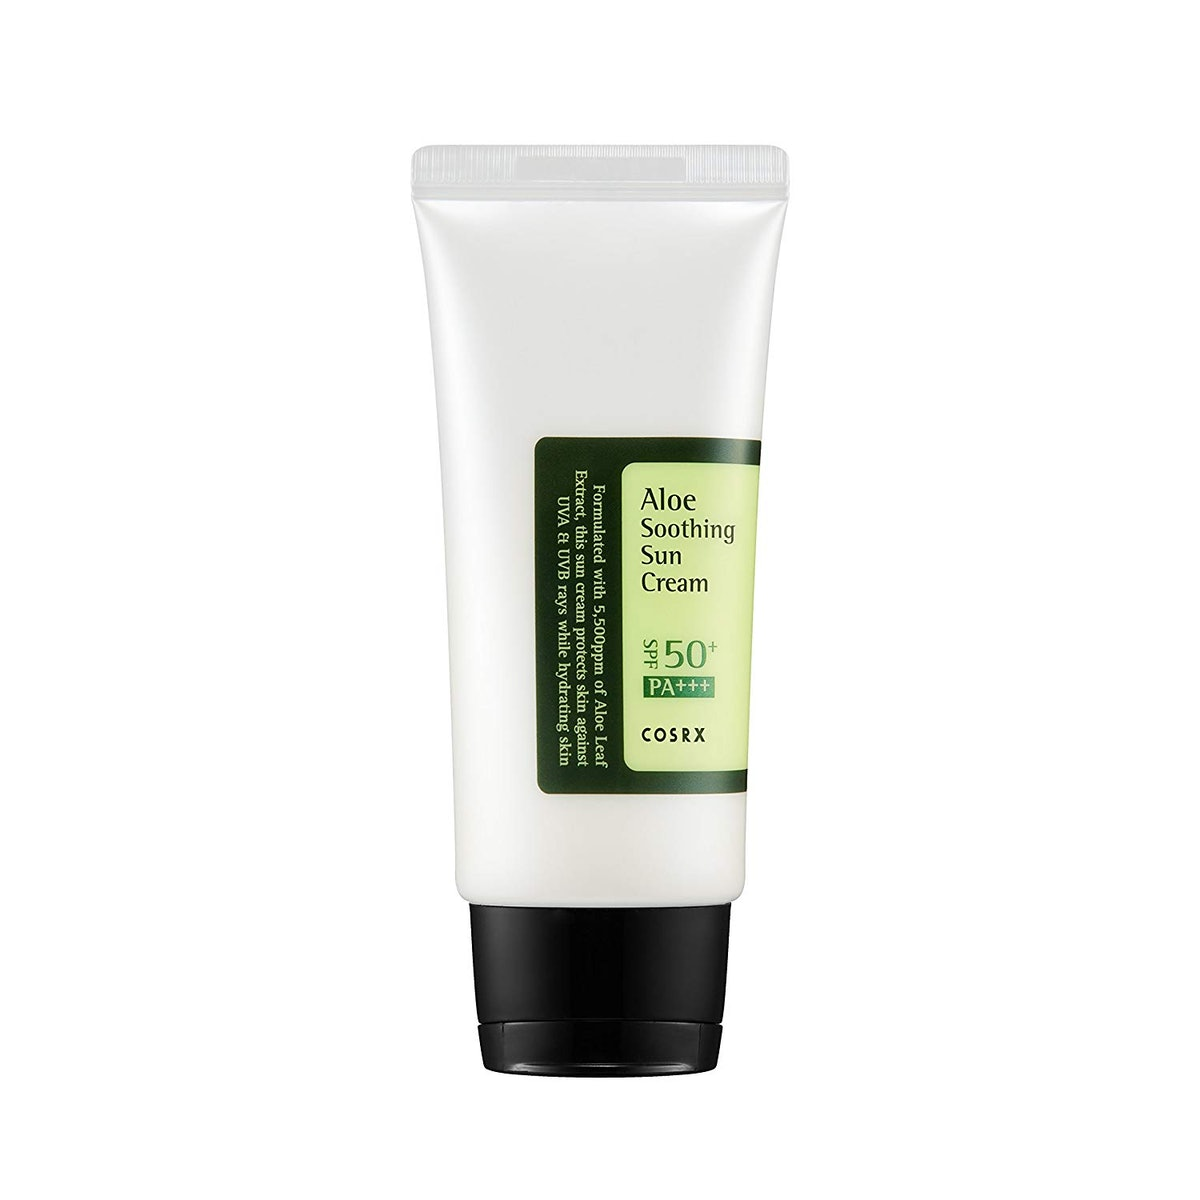 CosRx Aloe Soothing Sun Cream SPF 50 PA+++